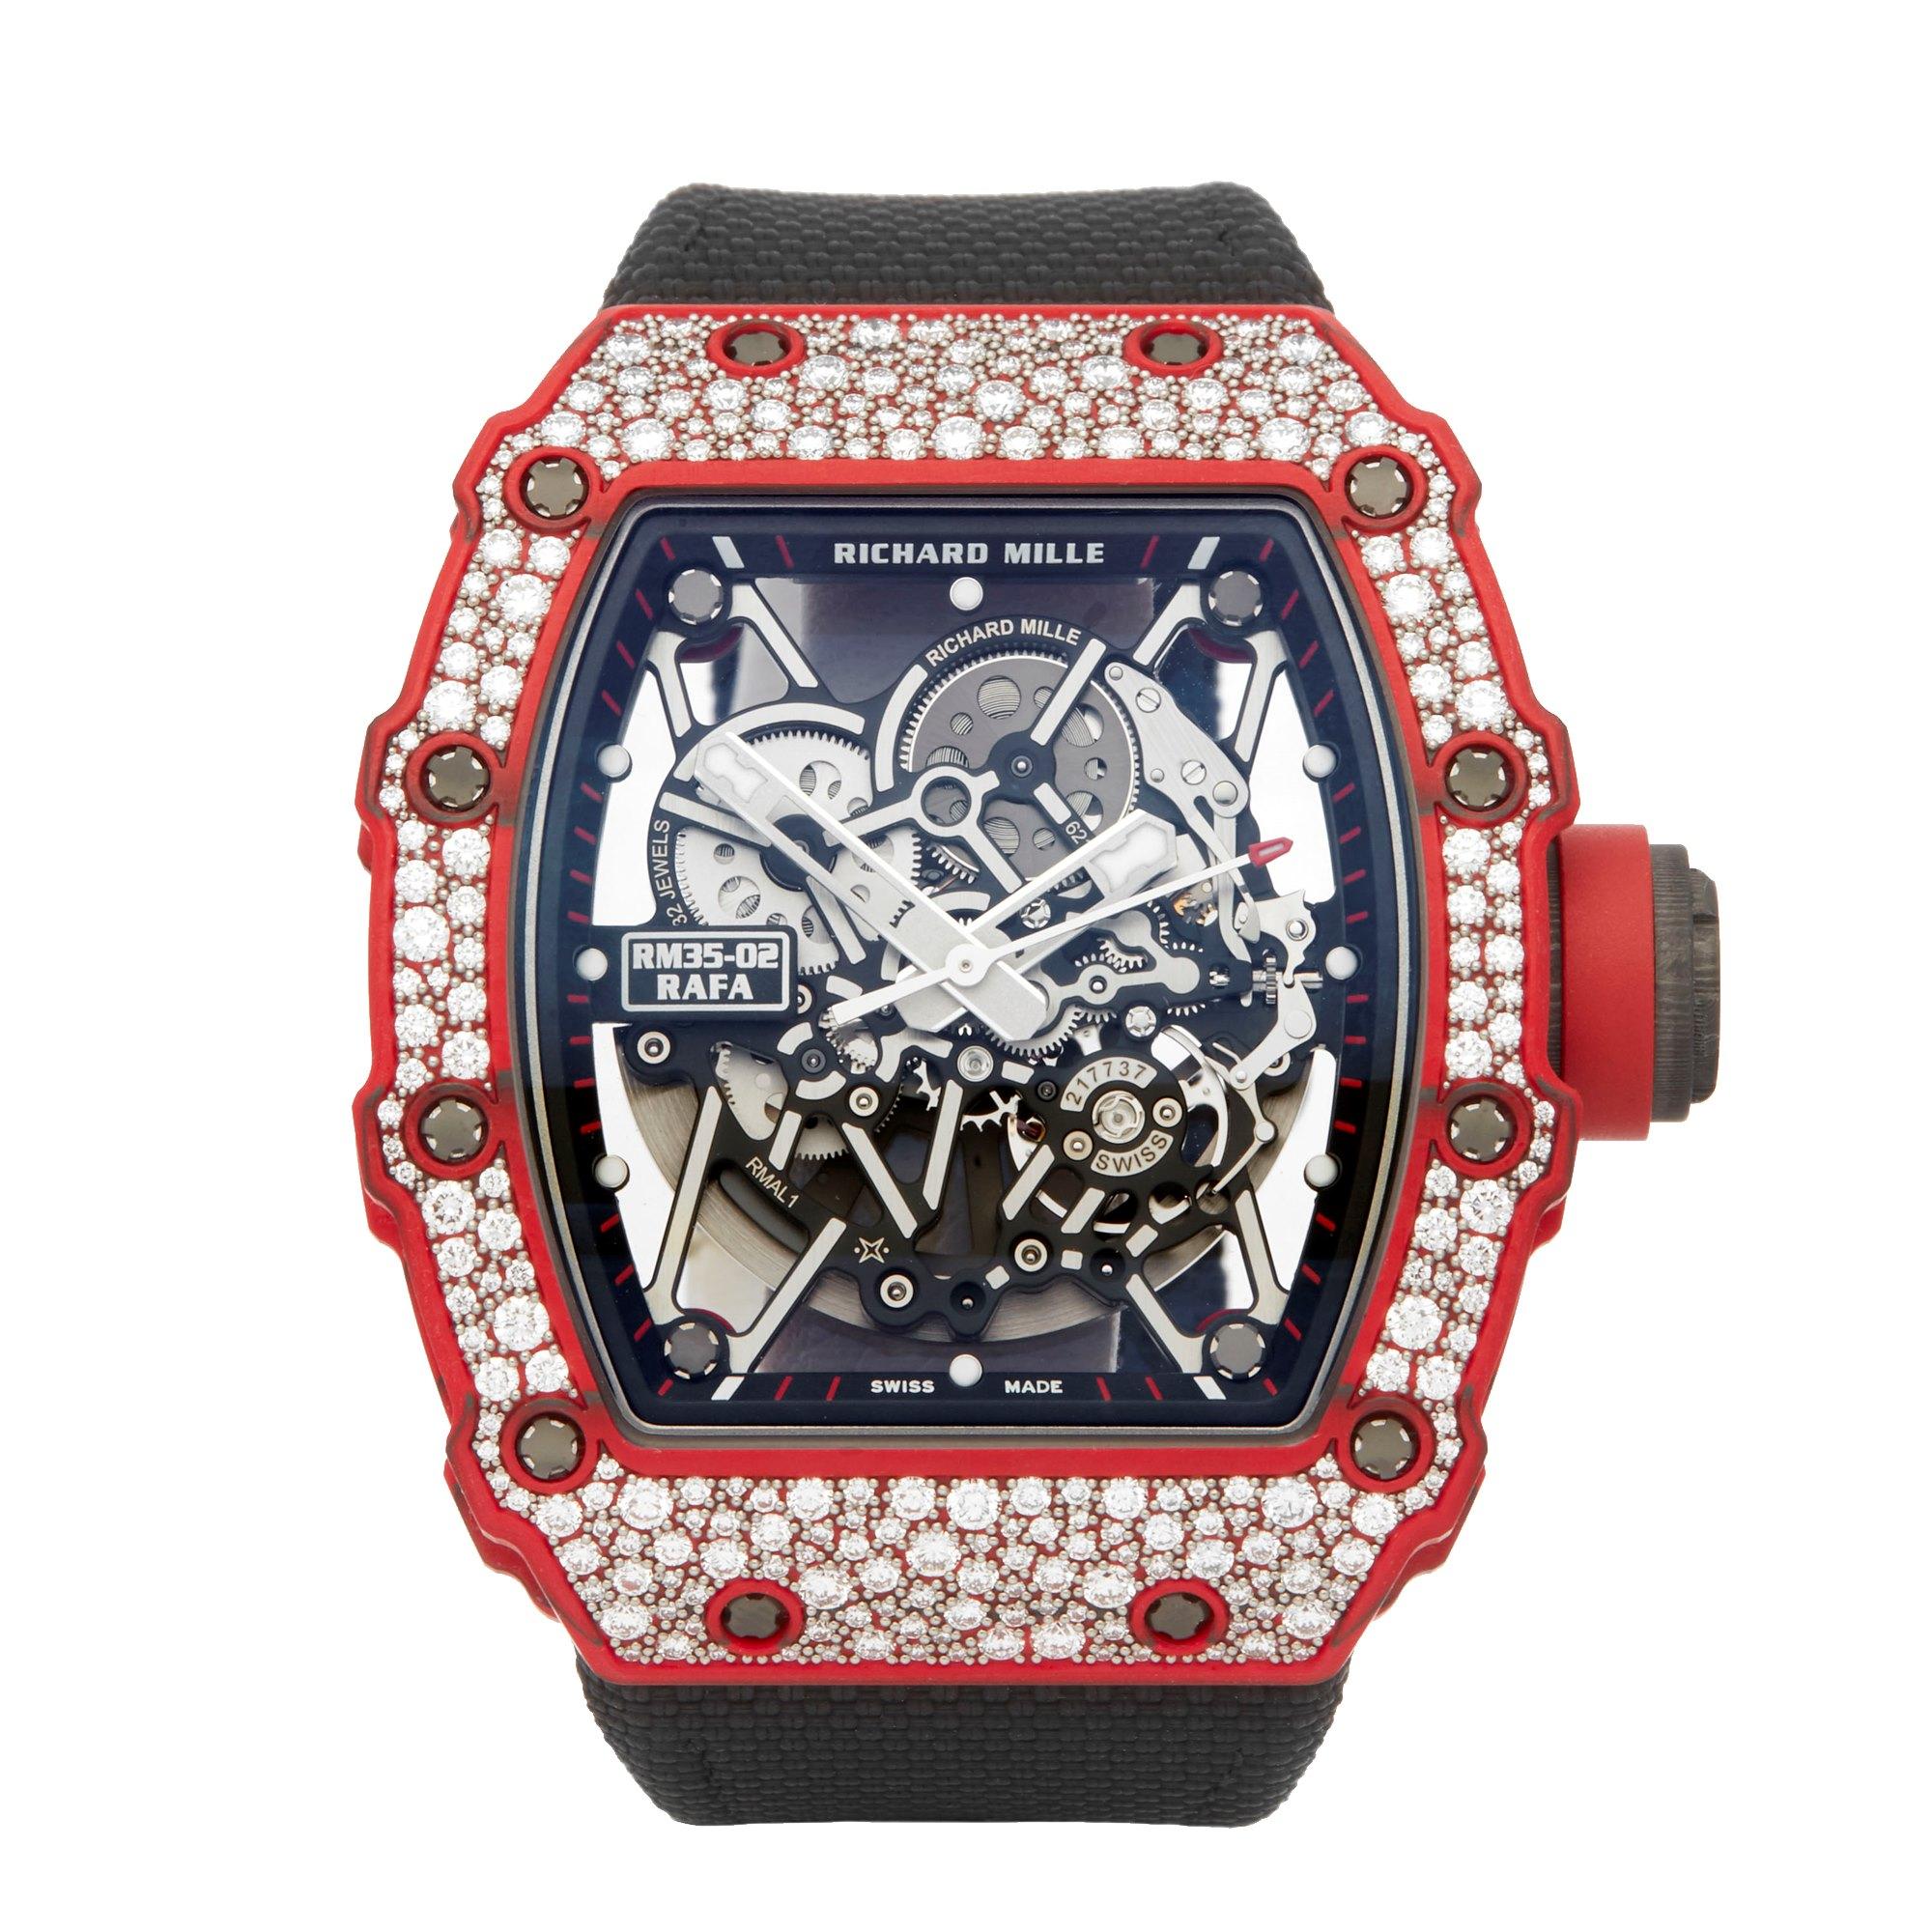 Richard Mille RM35 RM35-02 Rafa Diamond Carbon